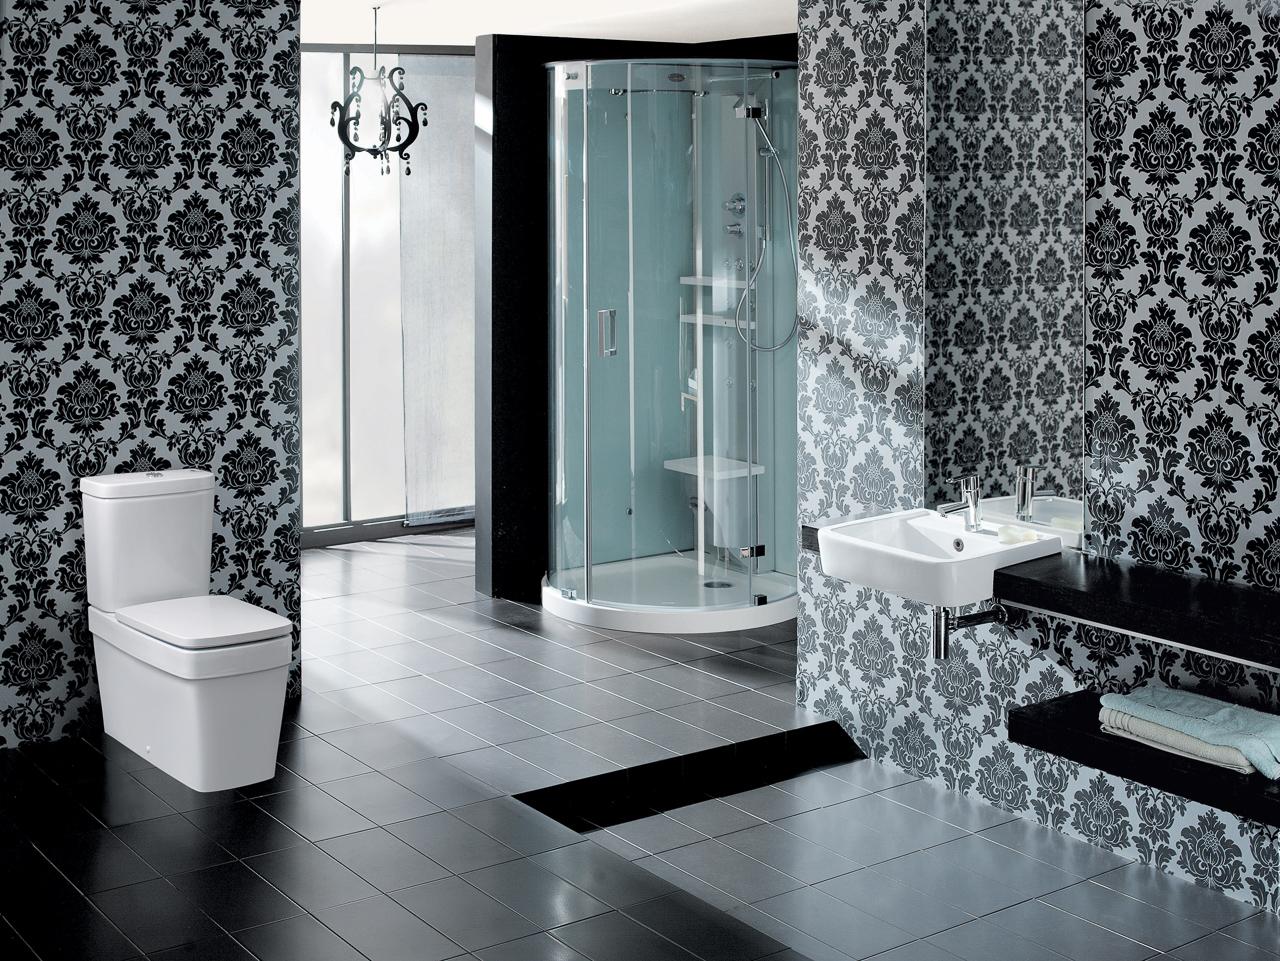 Silverdale Bathrooms: Henley Main